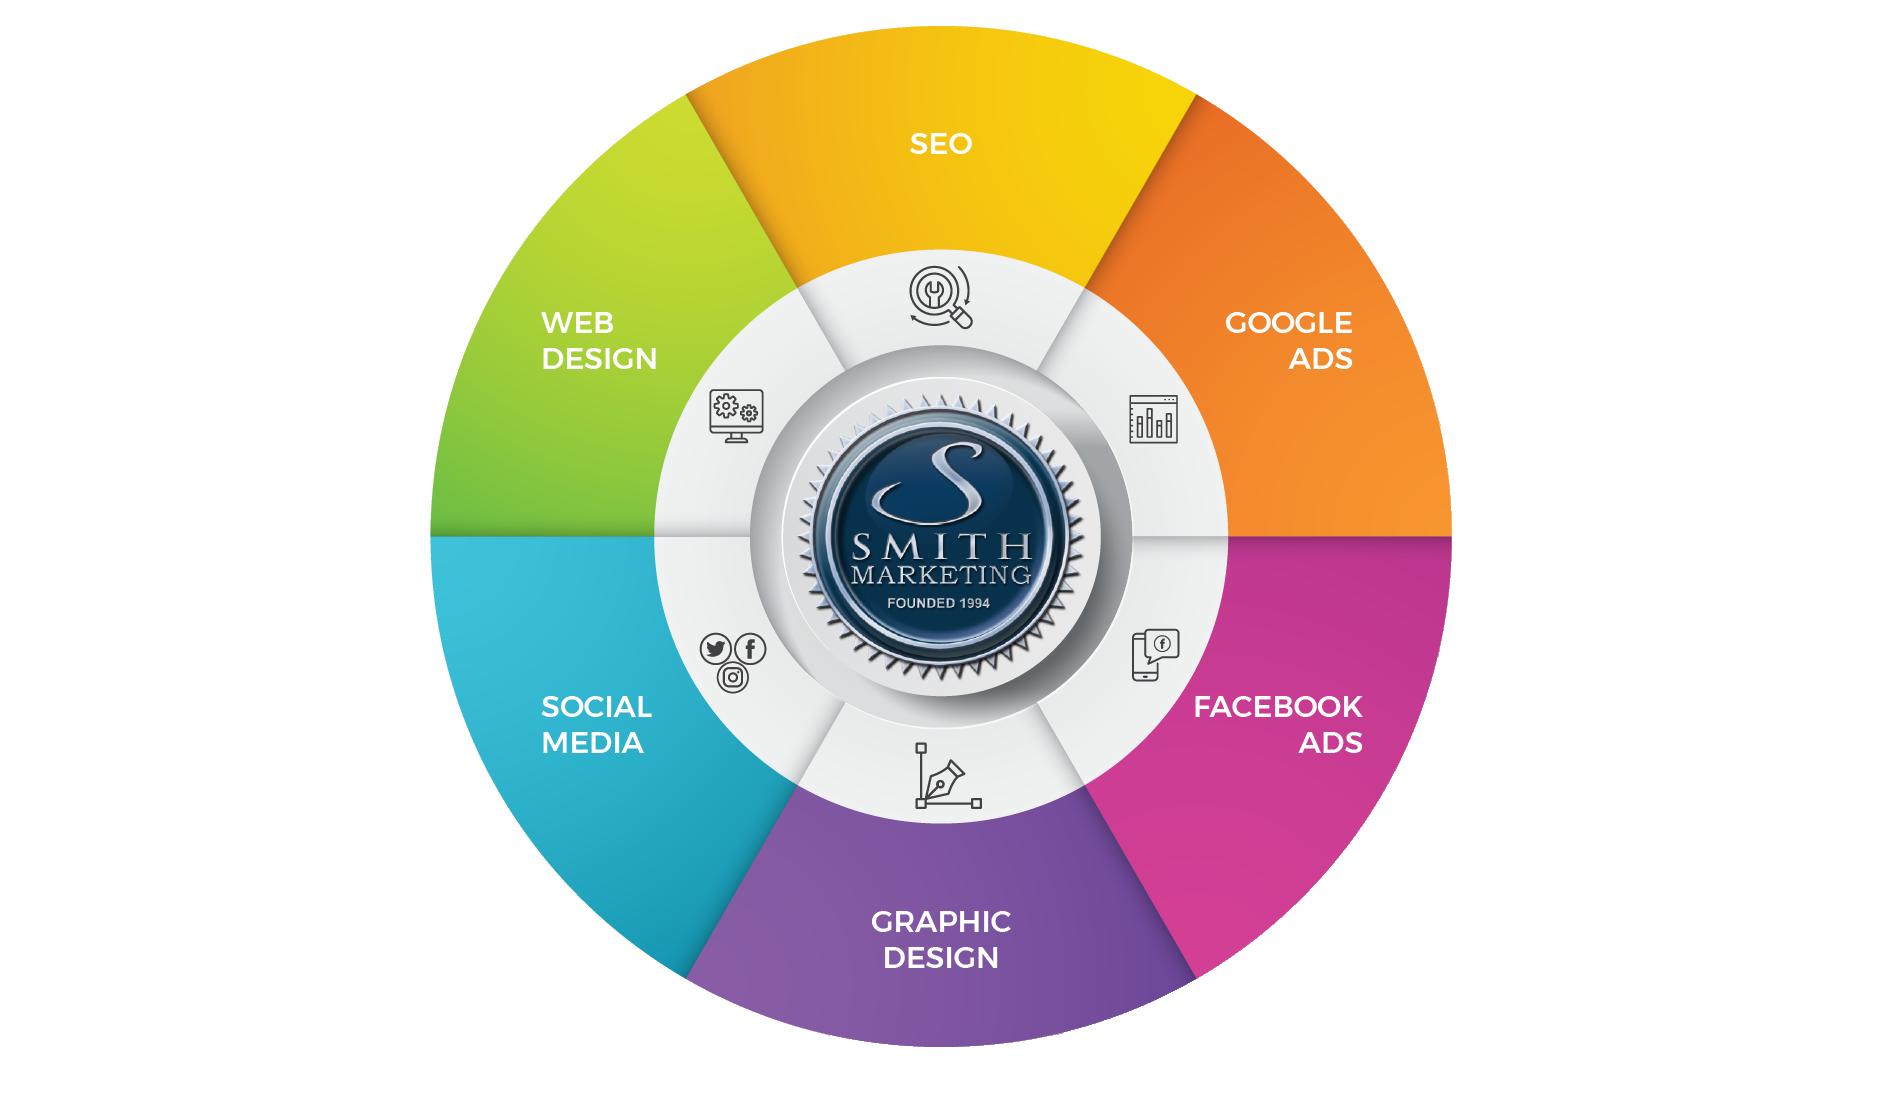 Web Design And Digital Marketing Agency Smith Marketing